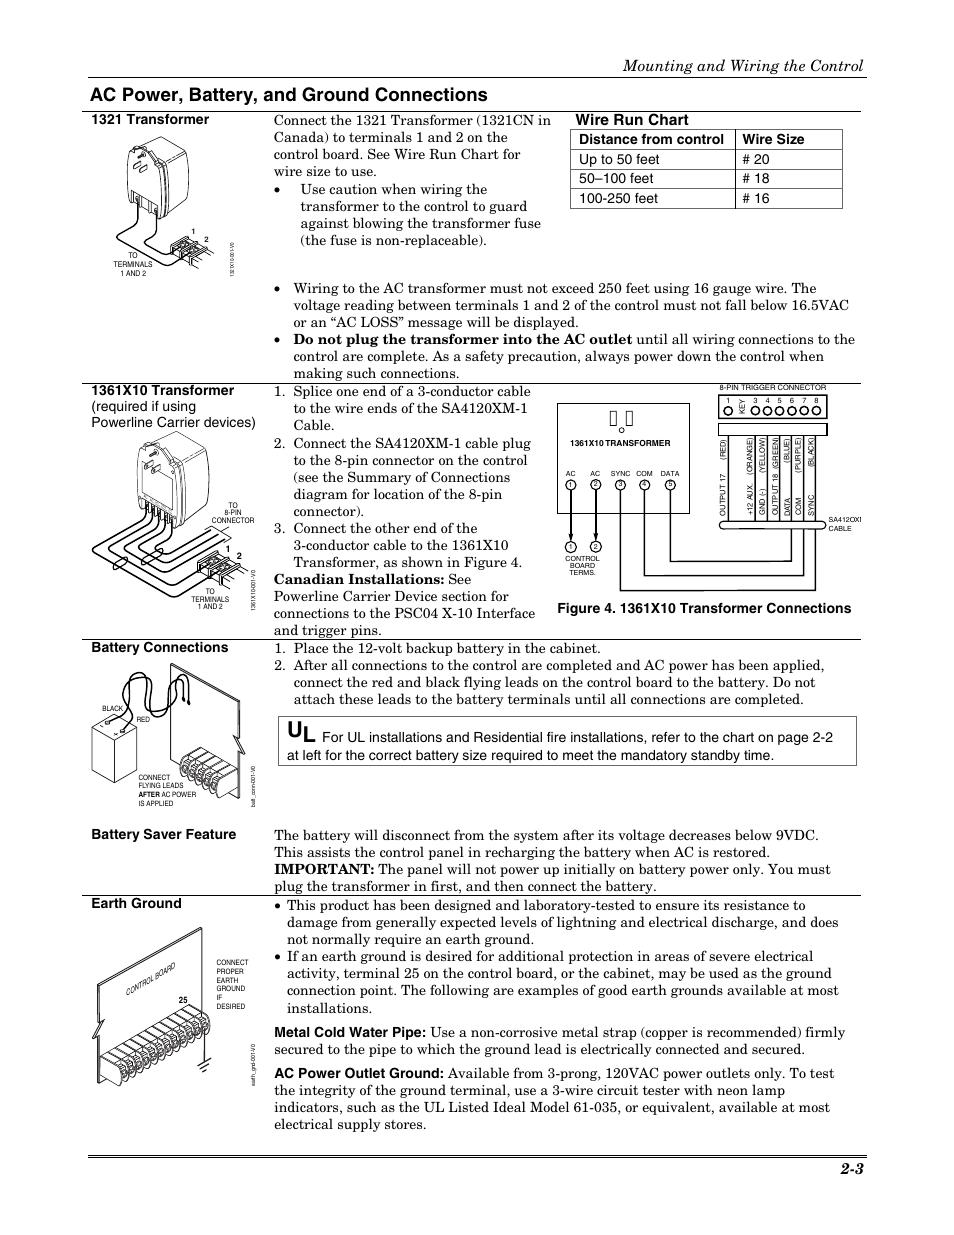 honeywell vista 20p wiring diagram. Black Bedroom Furniture Sets. Home Design Ideas